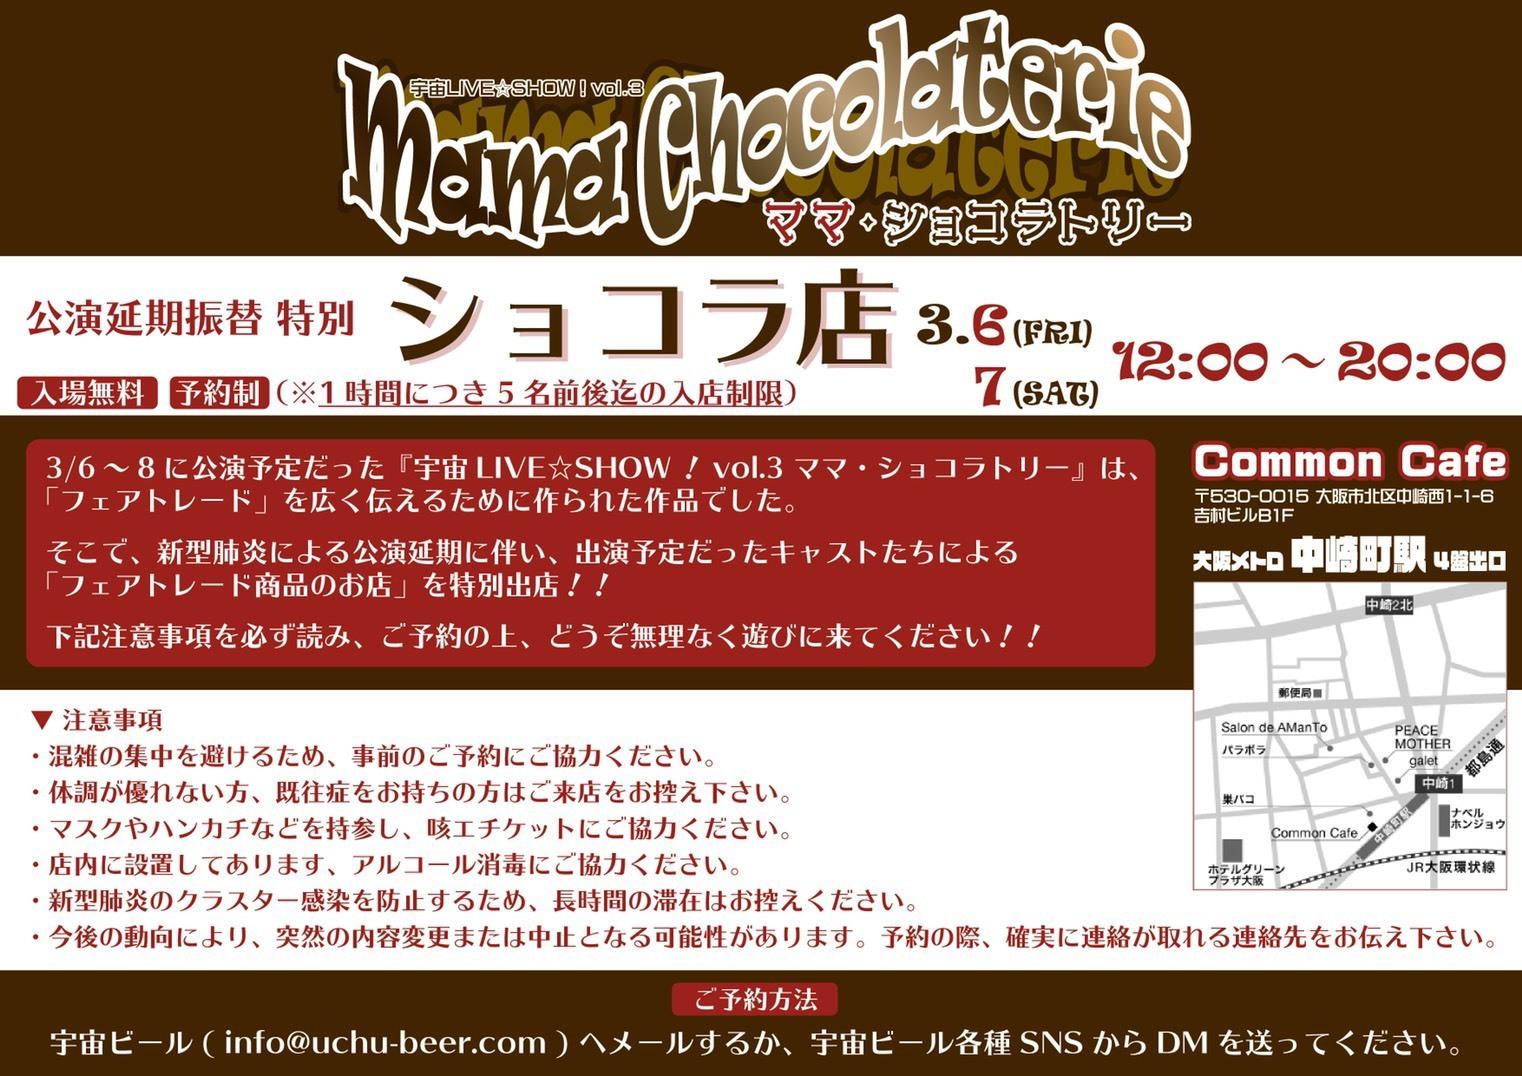 公演延期振替 特別🍫ショコラ店 3/6(金) 7(土) 12:00~20:00_c0180209_23051386.jpeg